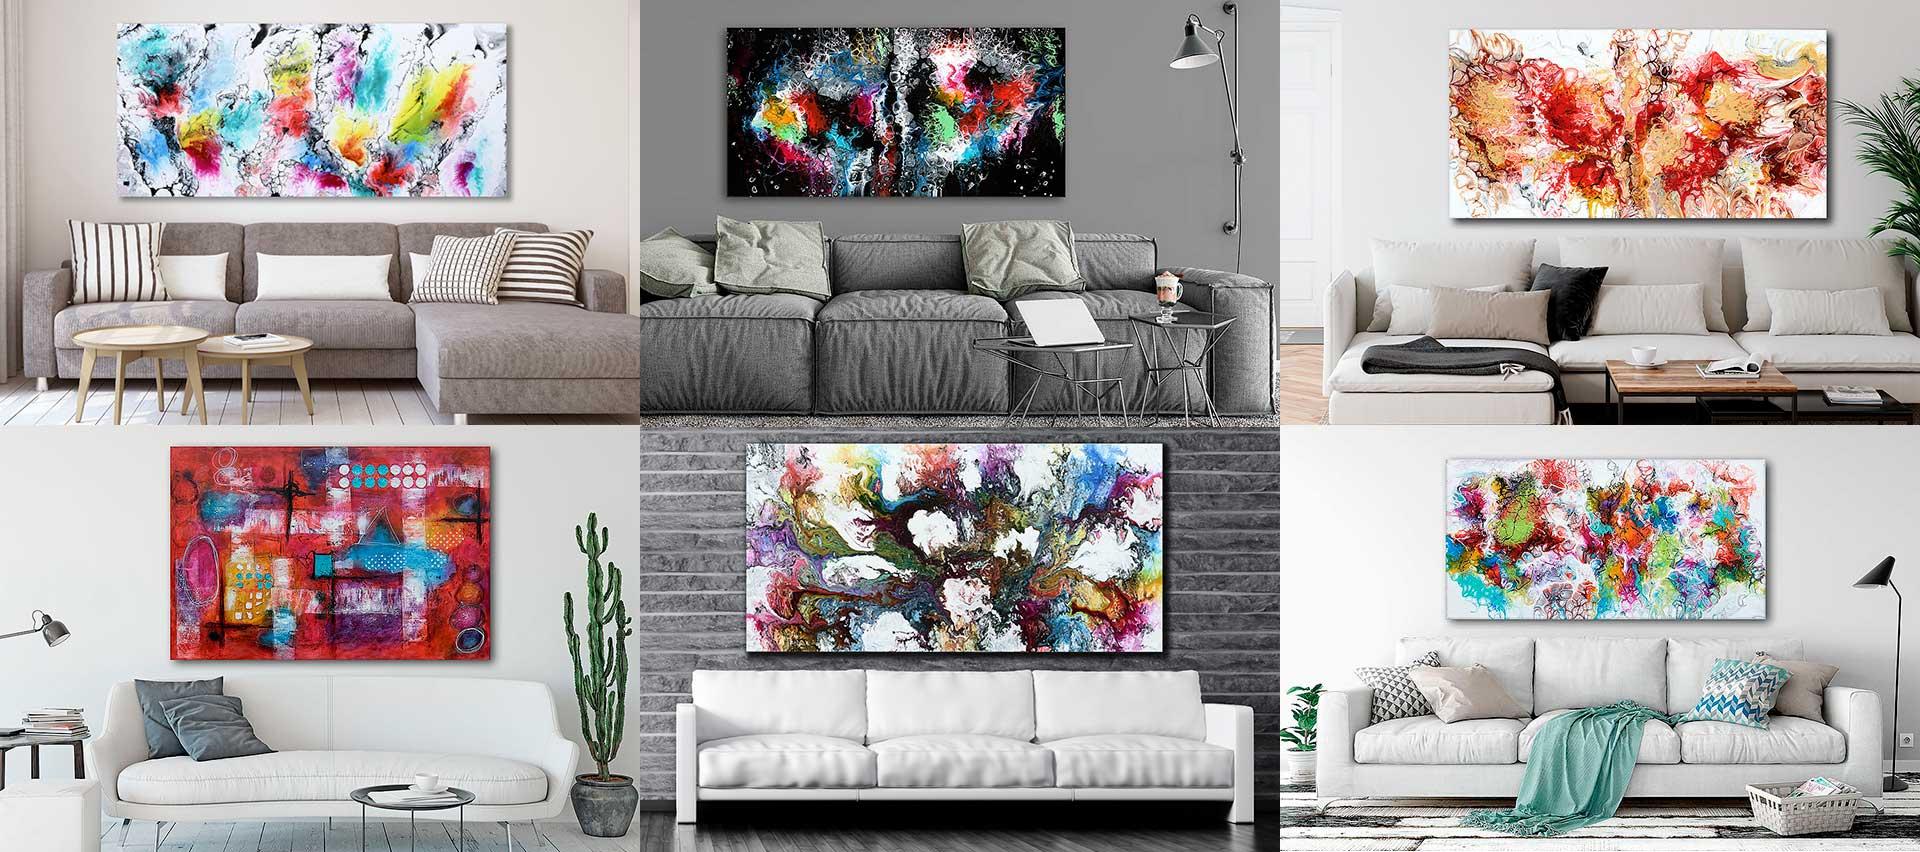 Gemälde Wandbilder Leinwandbilder Kunstwerke moderne Kunst von Michael Lönfeldt